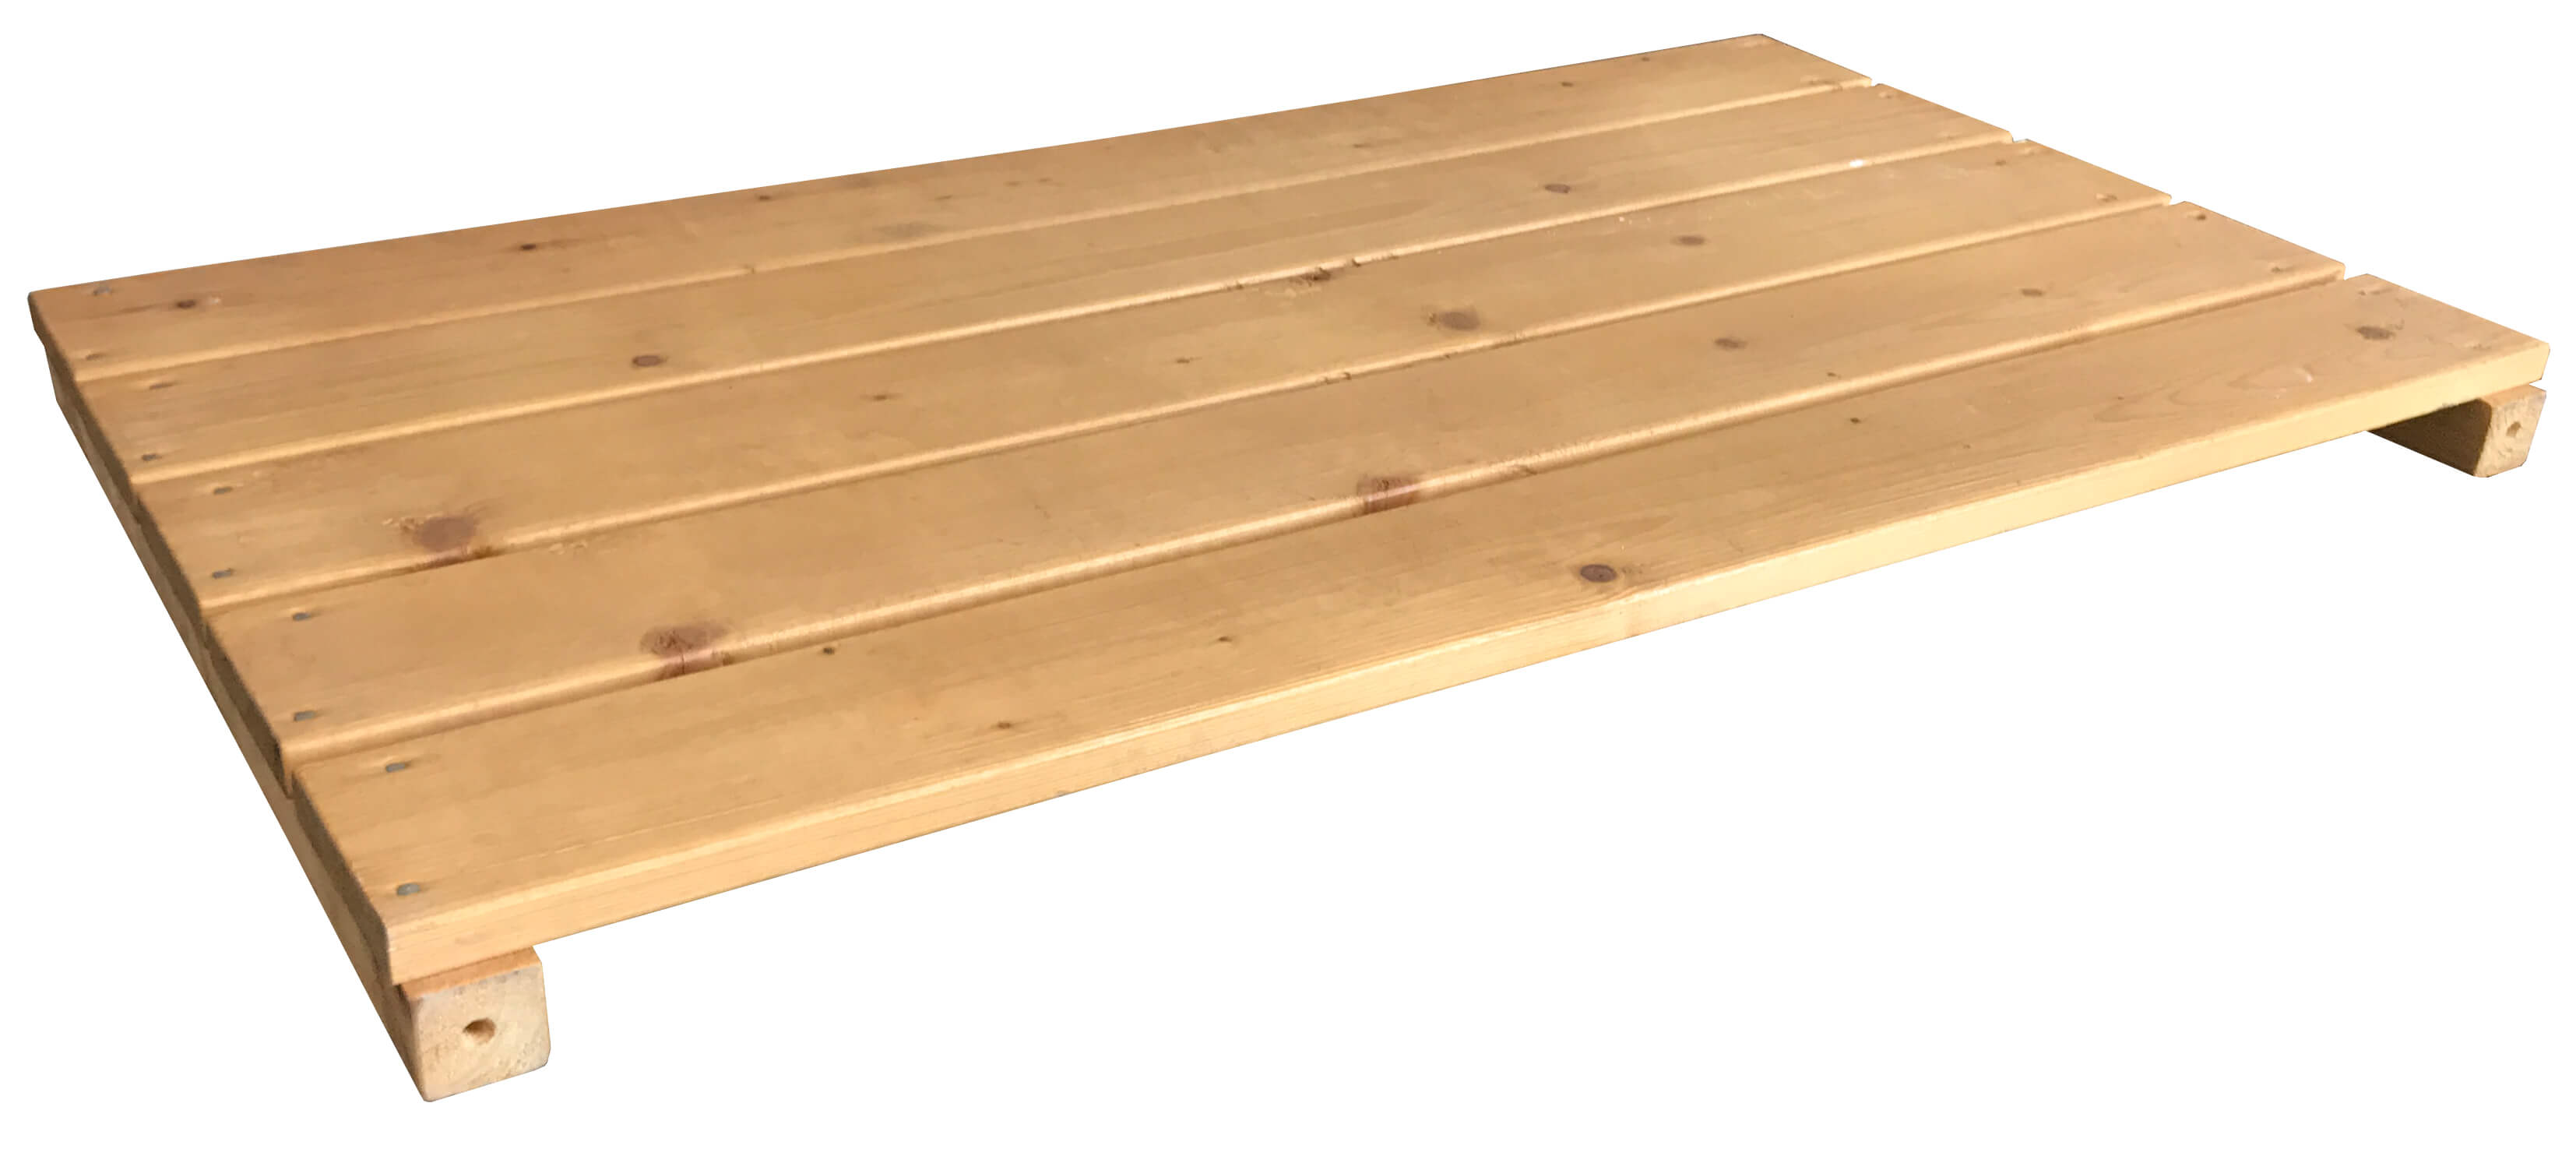 Ikea Regalboden ikea gorm regalboden nadelholz 89cm x 51cm 400 585 17 40058517